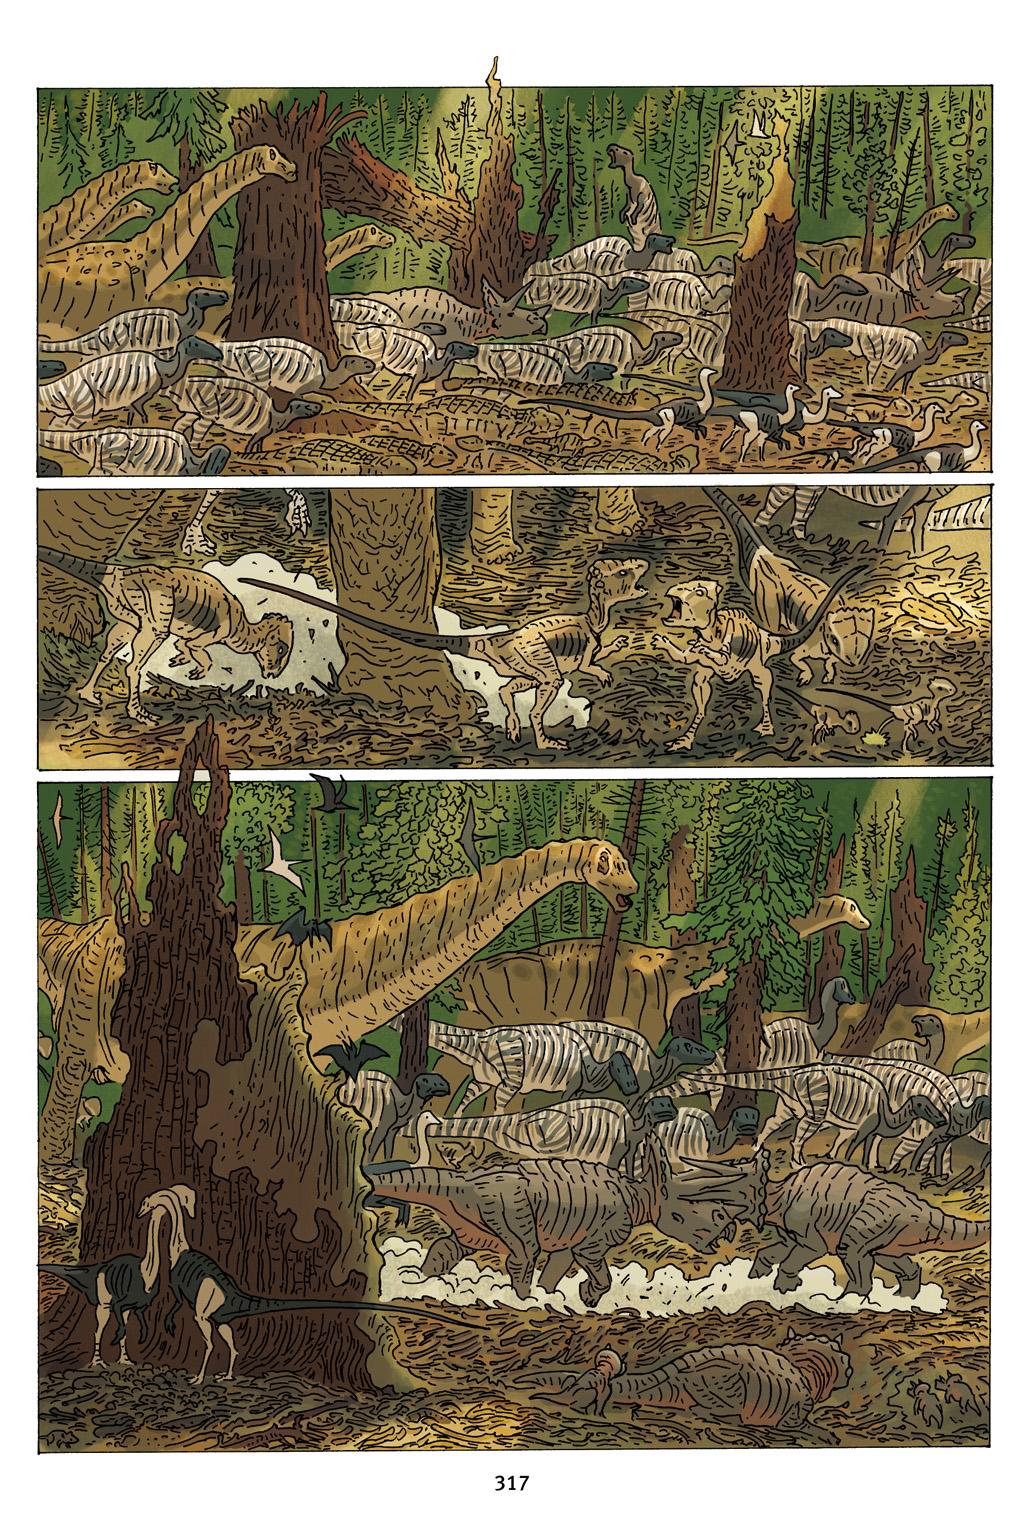 Age of Reptiles Omnibus Chap 112 - Next Chap 113